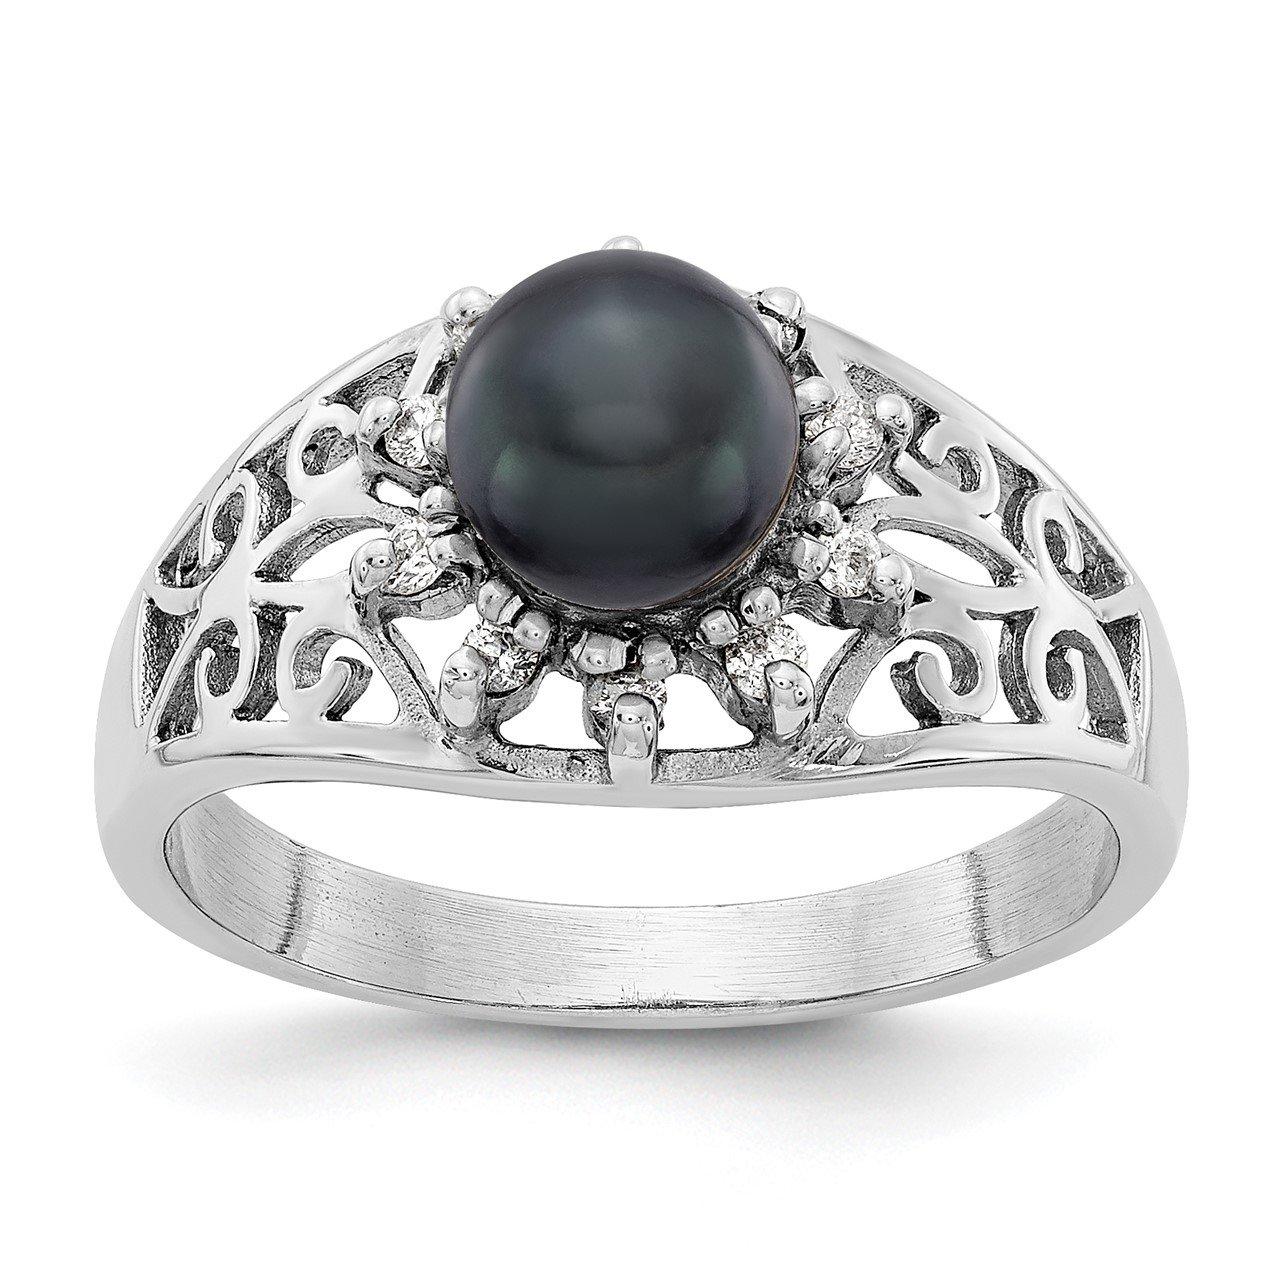 14k White Gold 6mm Black FW Cultured Pearl VS Diamond ring